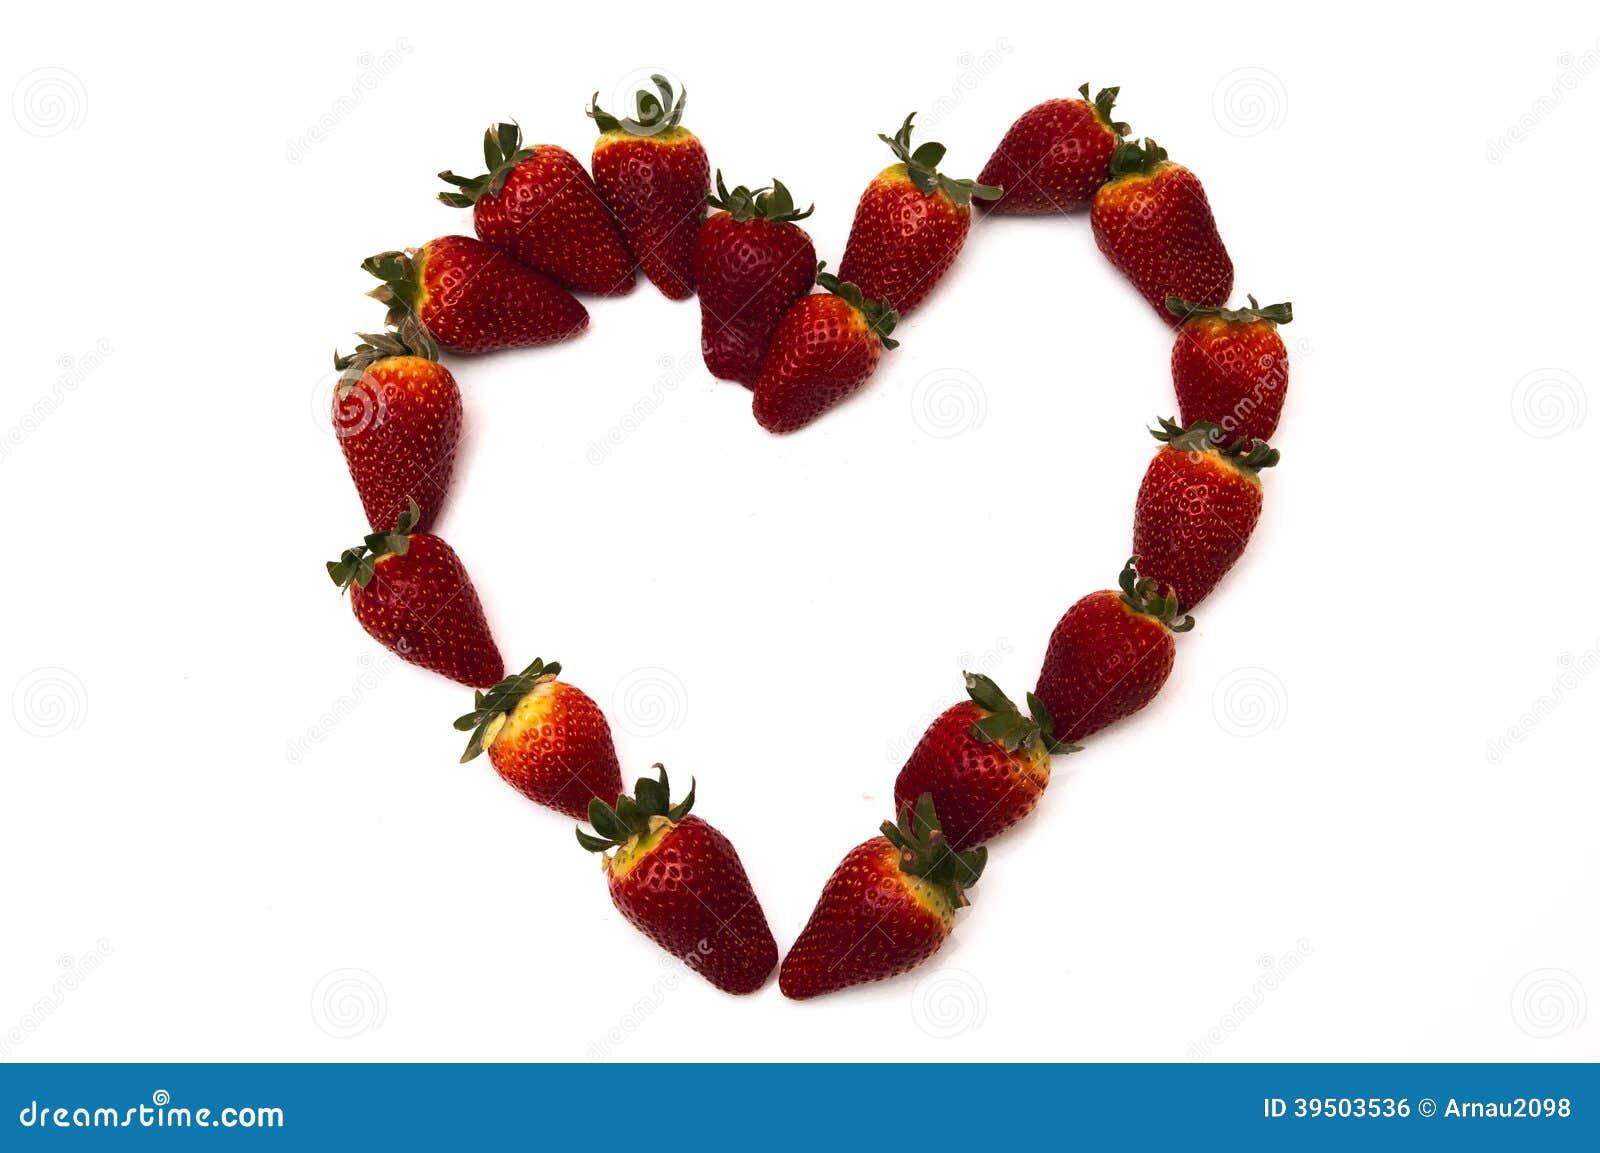 Fresh strawberries in heart shape